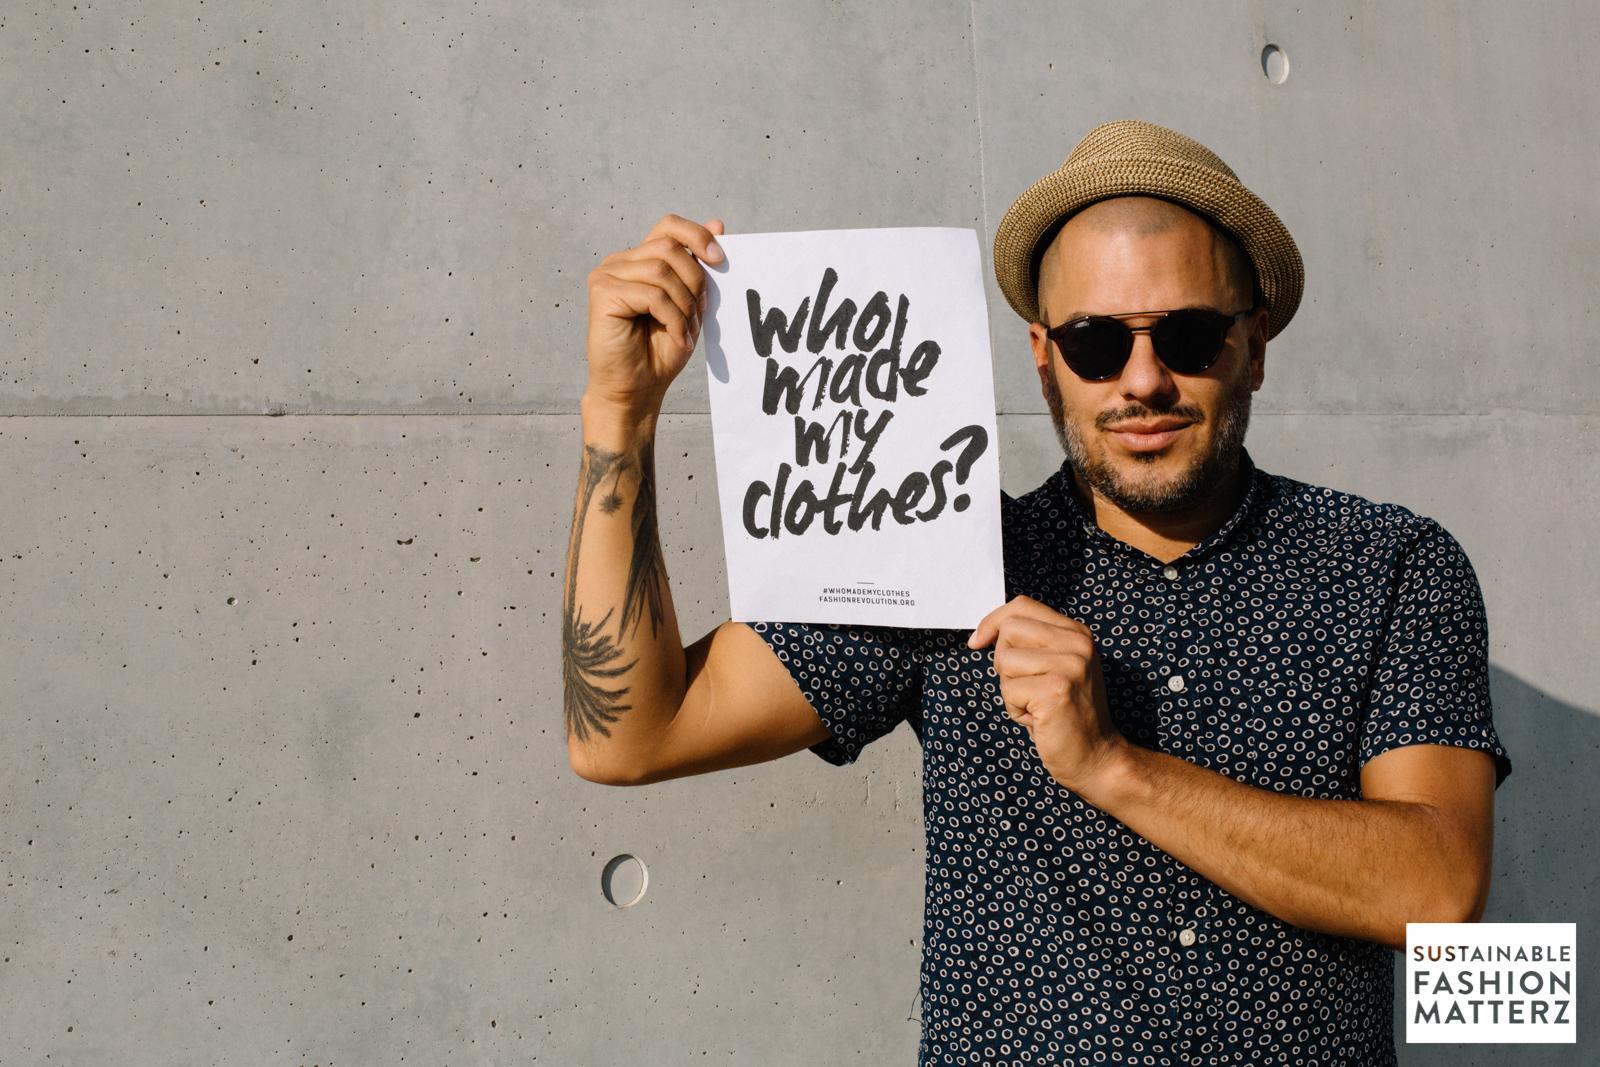 fashion-revolution-by-sustainable-fashion-matterz-101.jpg